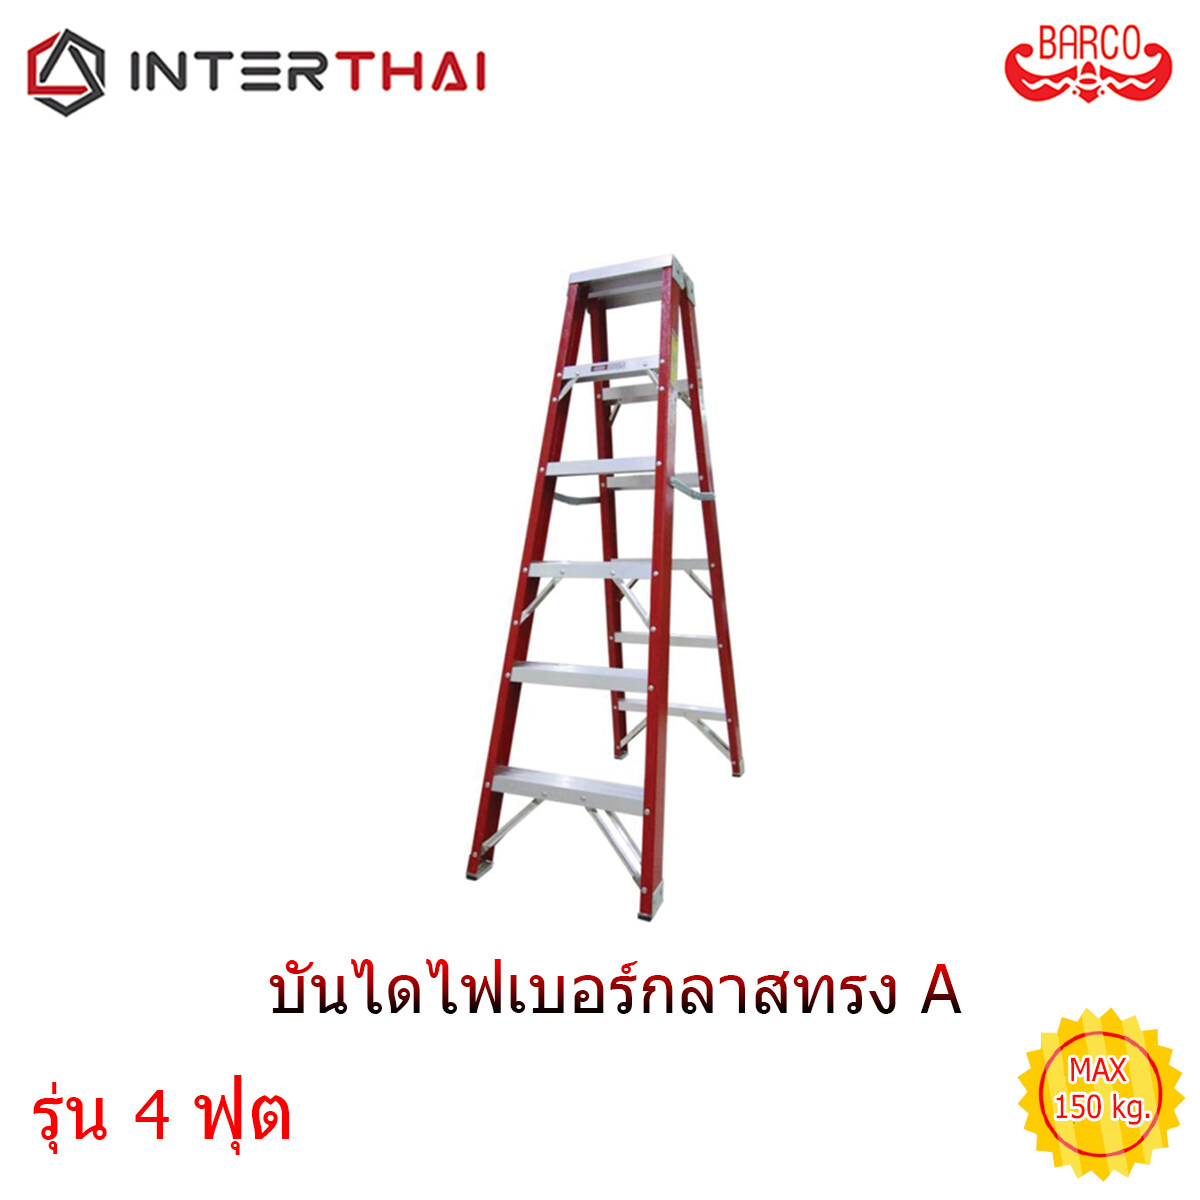 BARCO บันไดกันไฟ Fiberglass Ladder บันไดไฟเบอร์กลาส ขนาด 4 ฟุต 1.2เมตร ASNI Certified EN131 Certified บันไดนำเข้า หนาพิเศษ บันได บันไดพับ บันไดทรงA